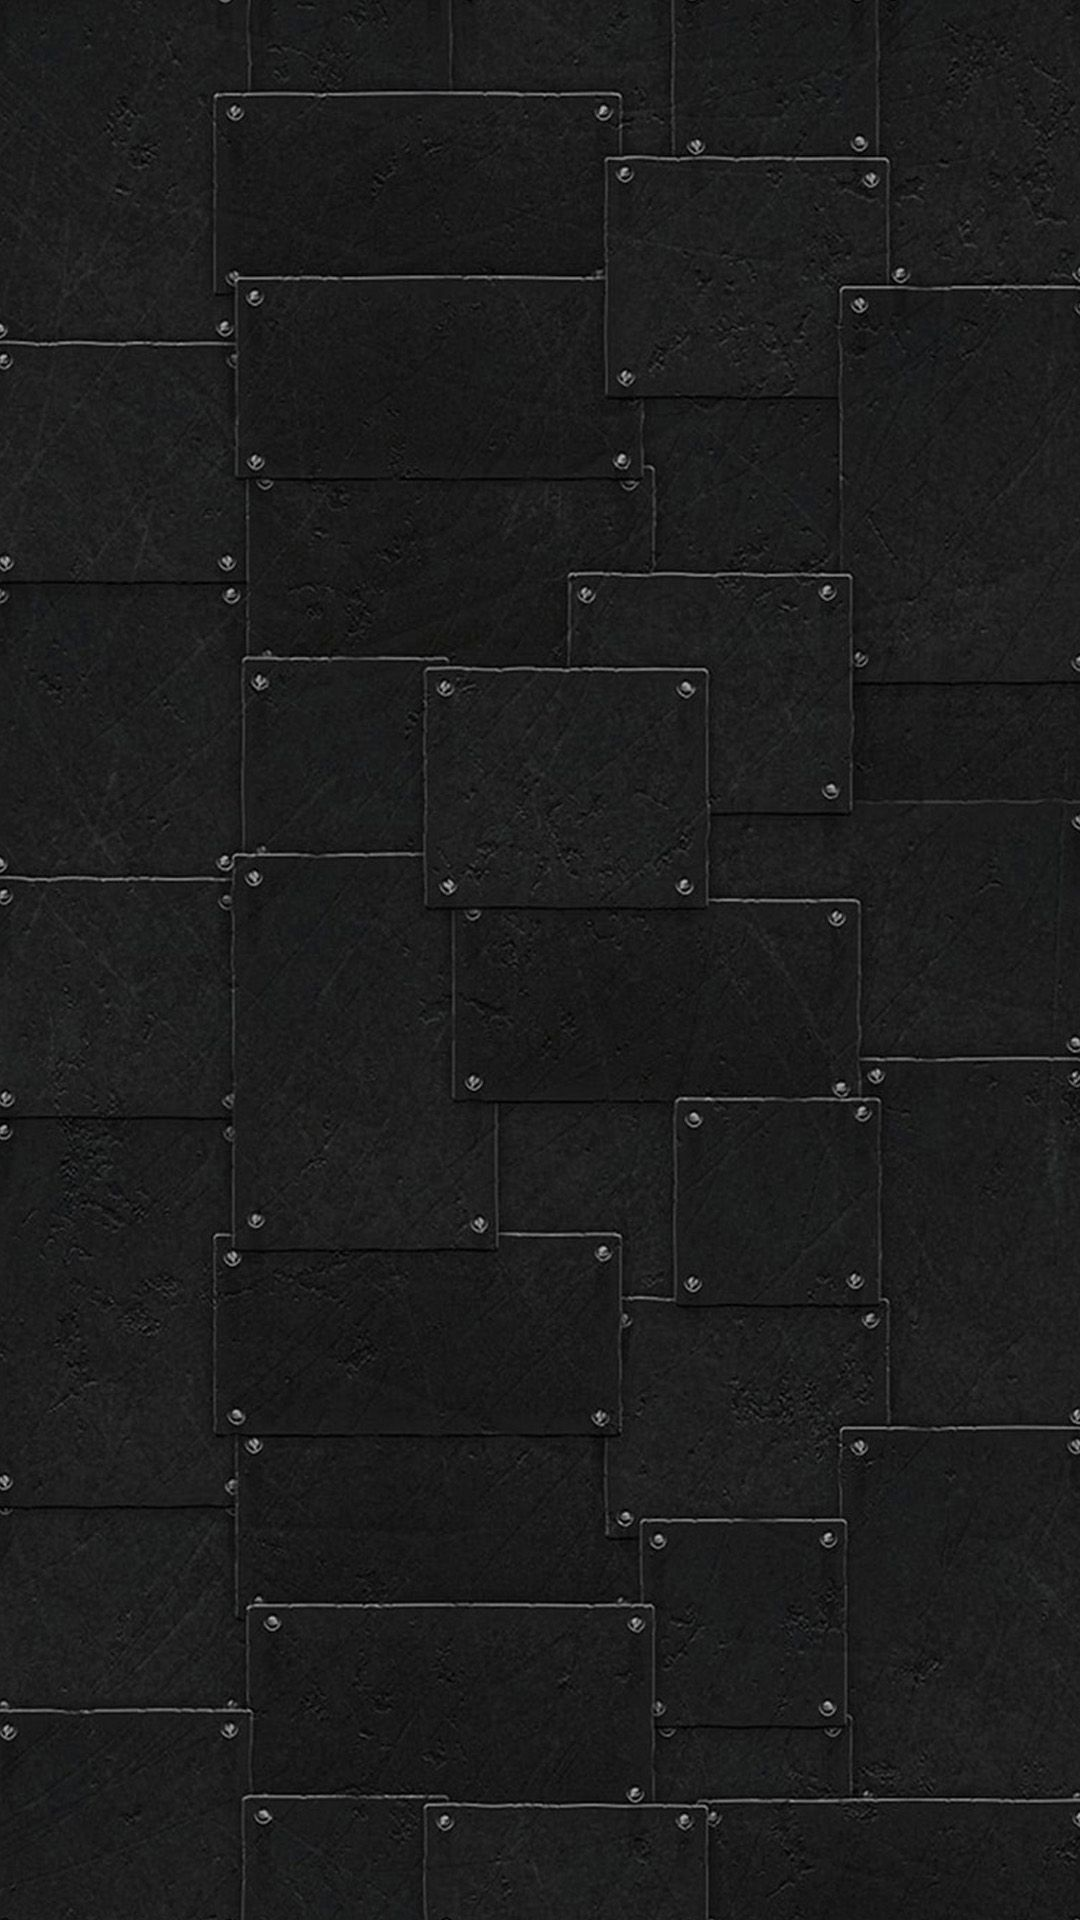 Nền đt の画像 投稿者 Selima さん 黒の壁紙 壁紙 壁紙